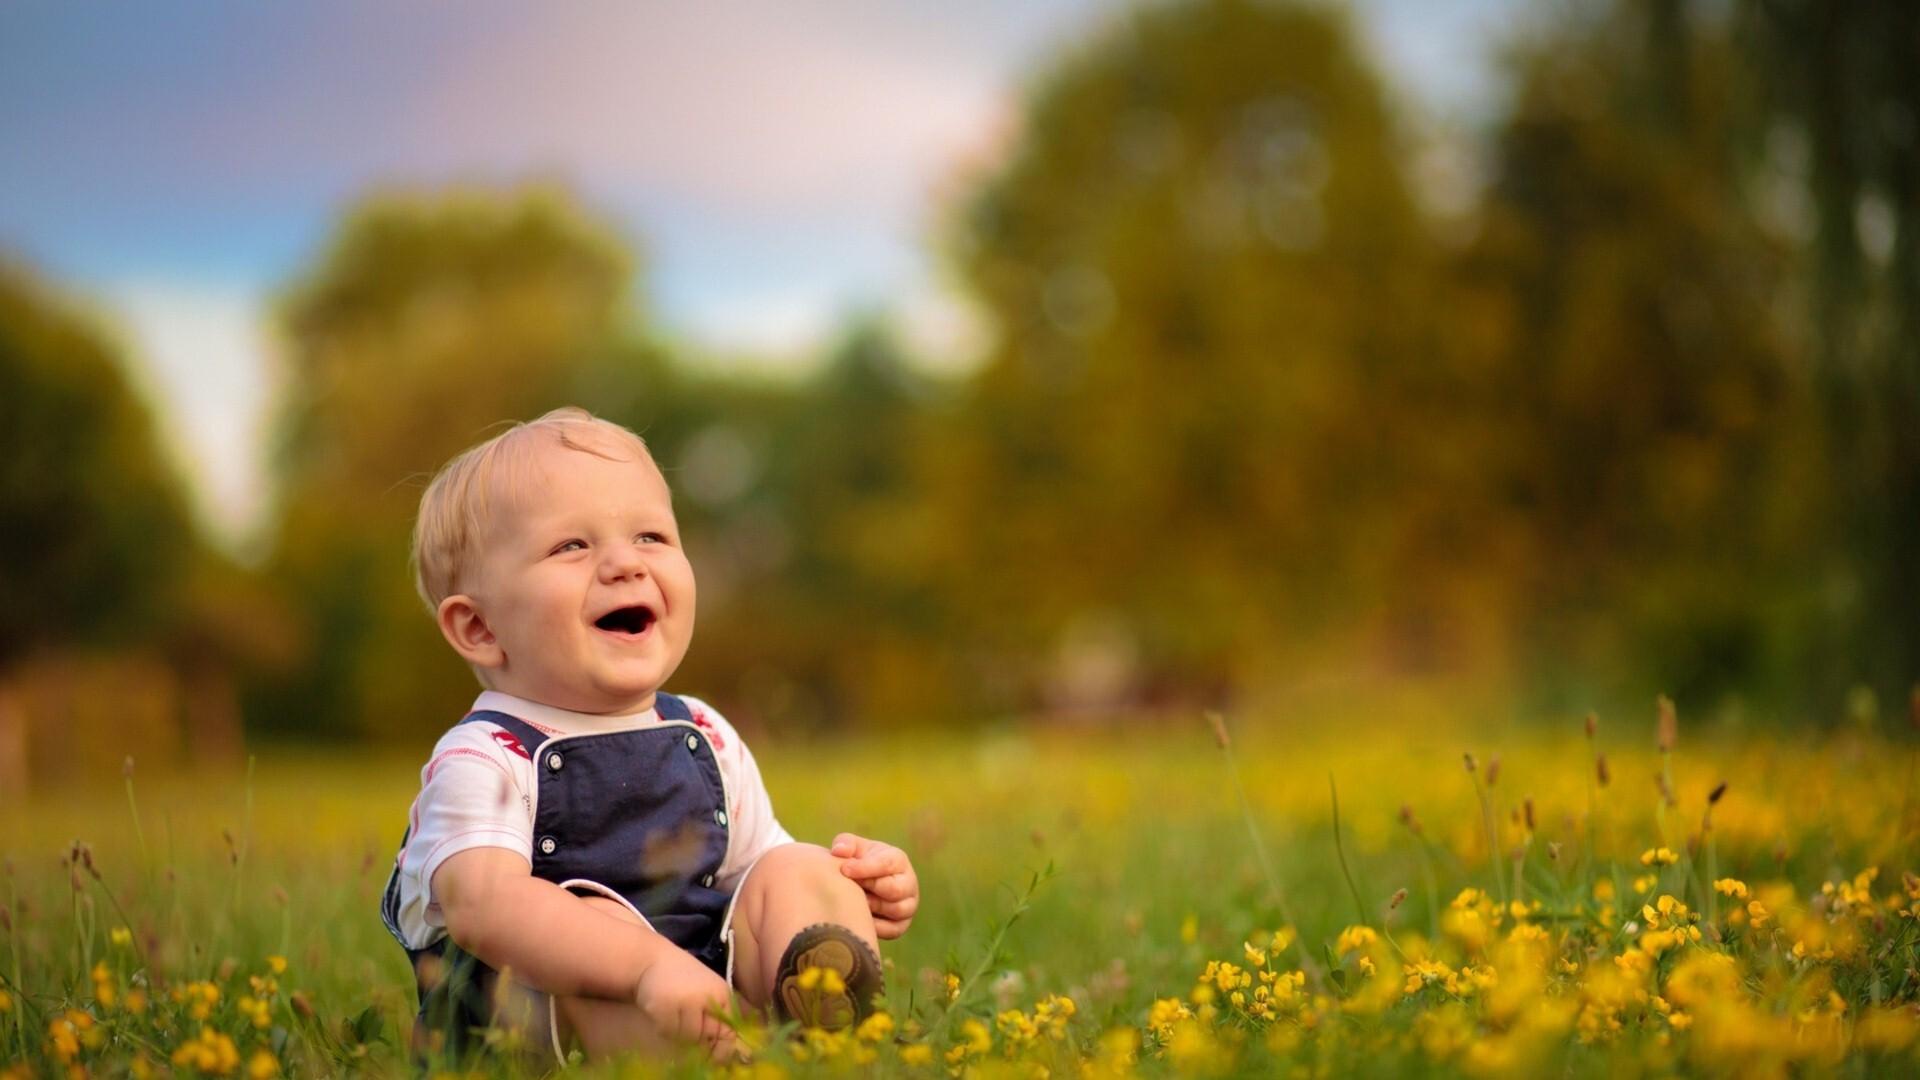 Smiling Beautiful Baby in Garden Photo | HD Wallpapers